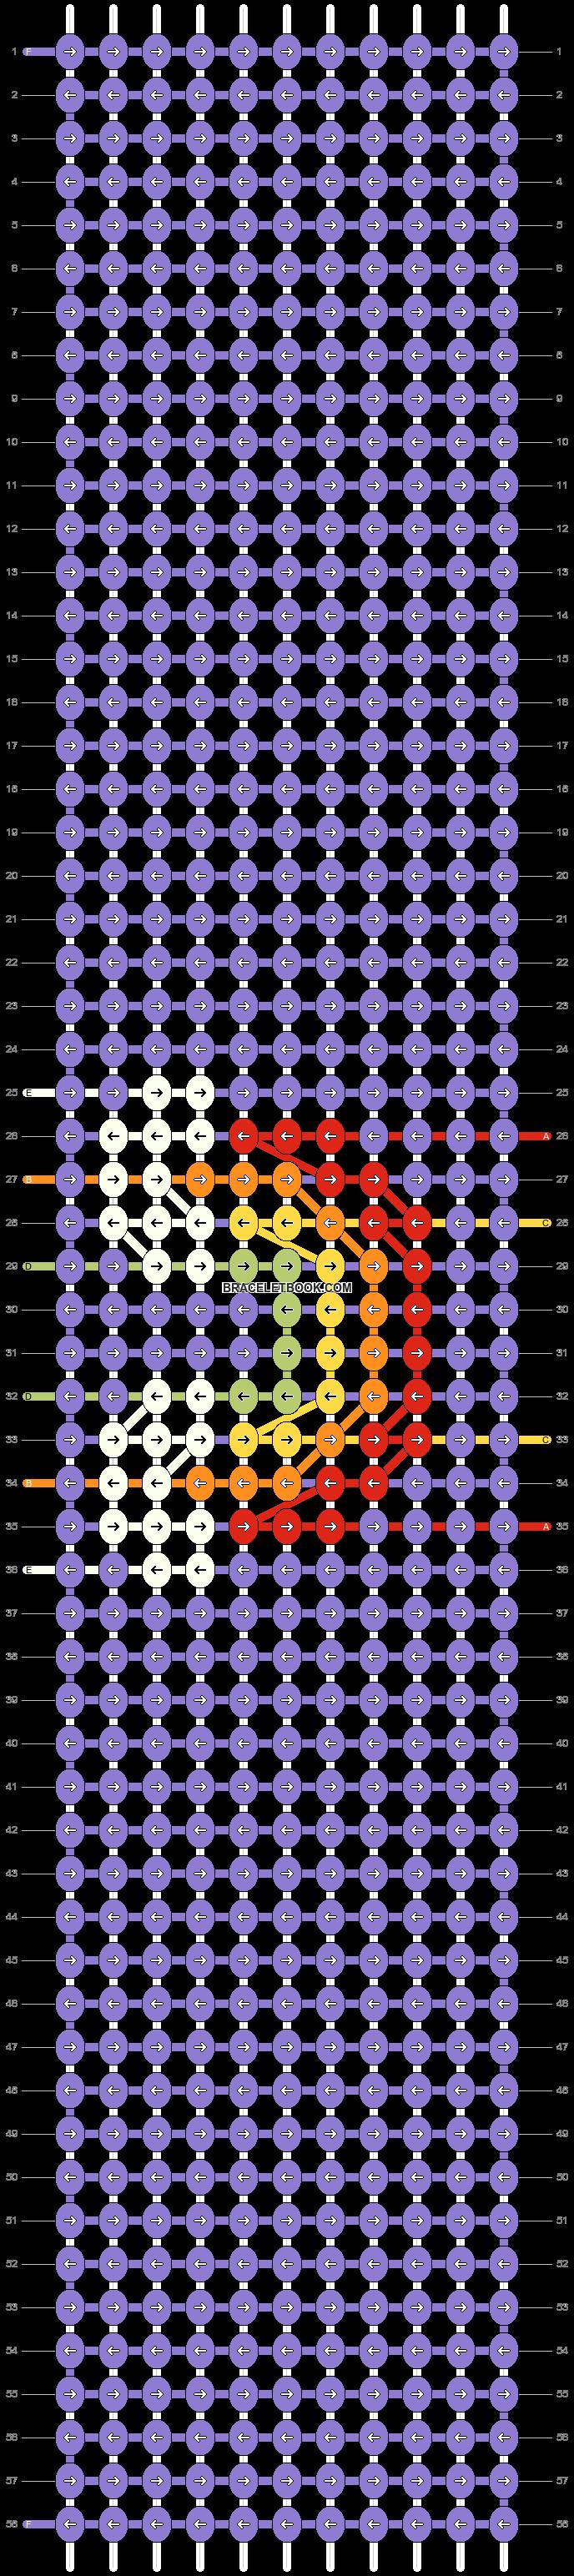 Alpha pattern #65325 variation #130195 pattern